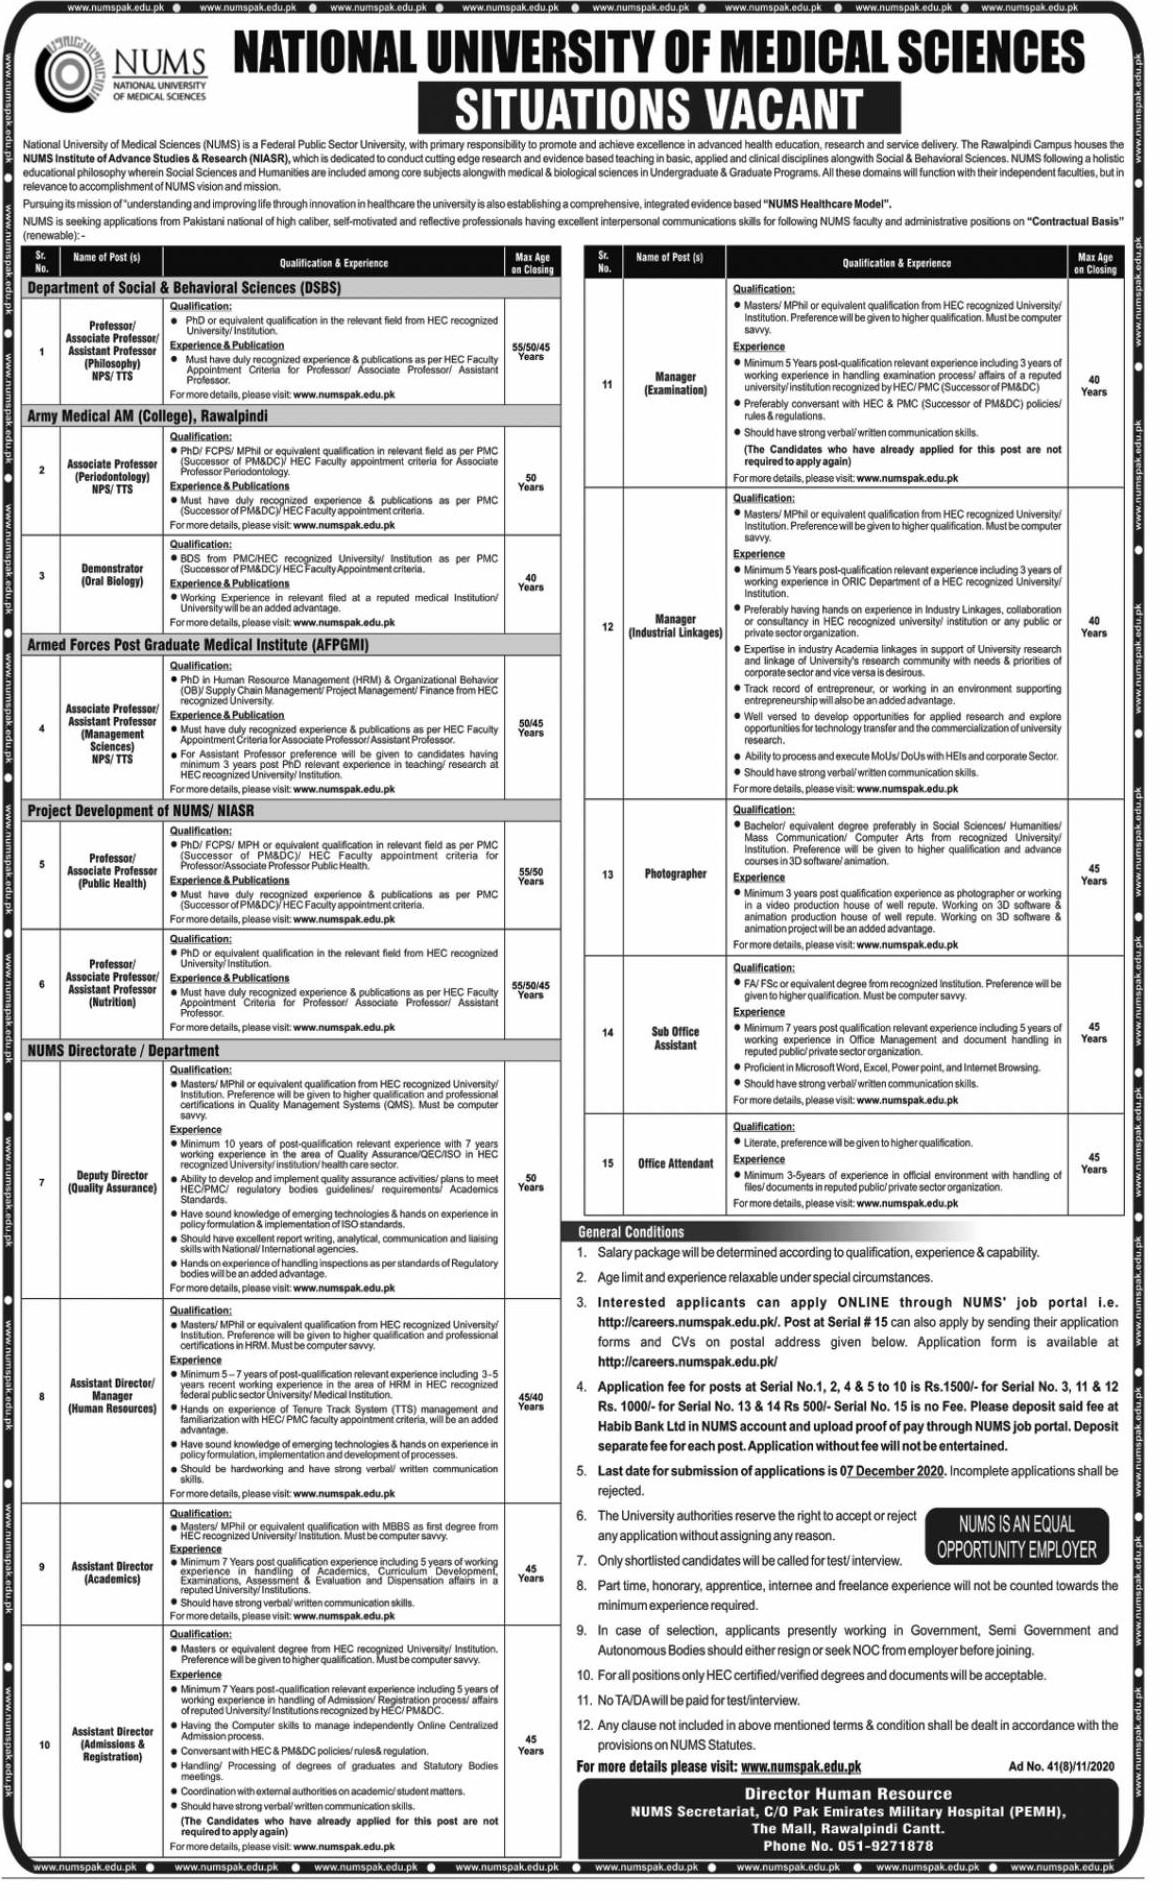 National University of Medical Sciences NUMS Jobs in Pakistan - Download Job Application Form - numspak.edu.pk/careers/ Jobs 2021